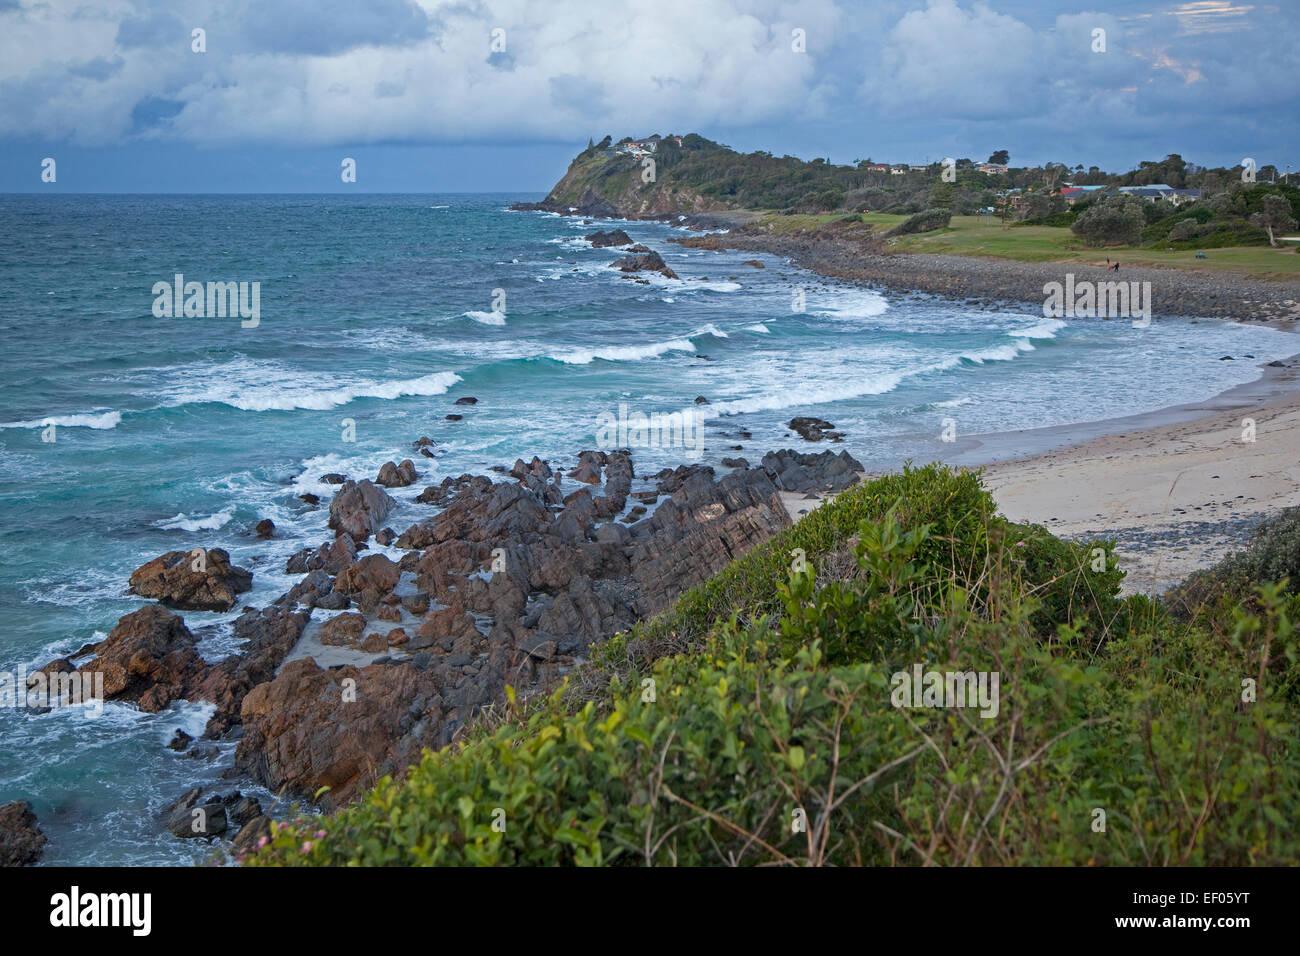 Rocky coast of Forster along the  Tasman Sea, New South Wales, Australia - Stock Image